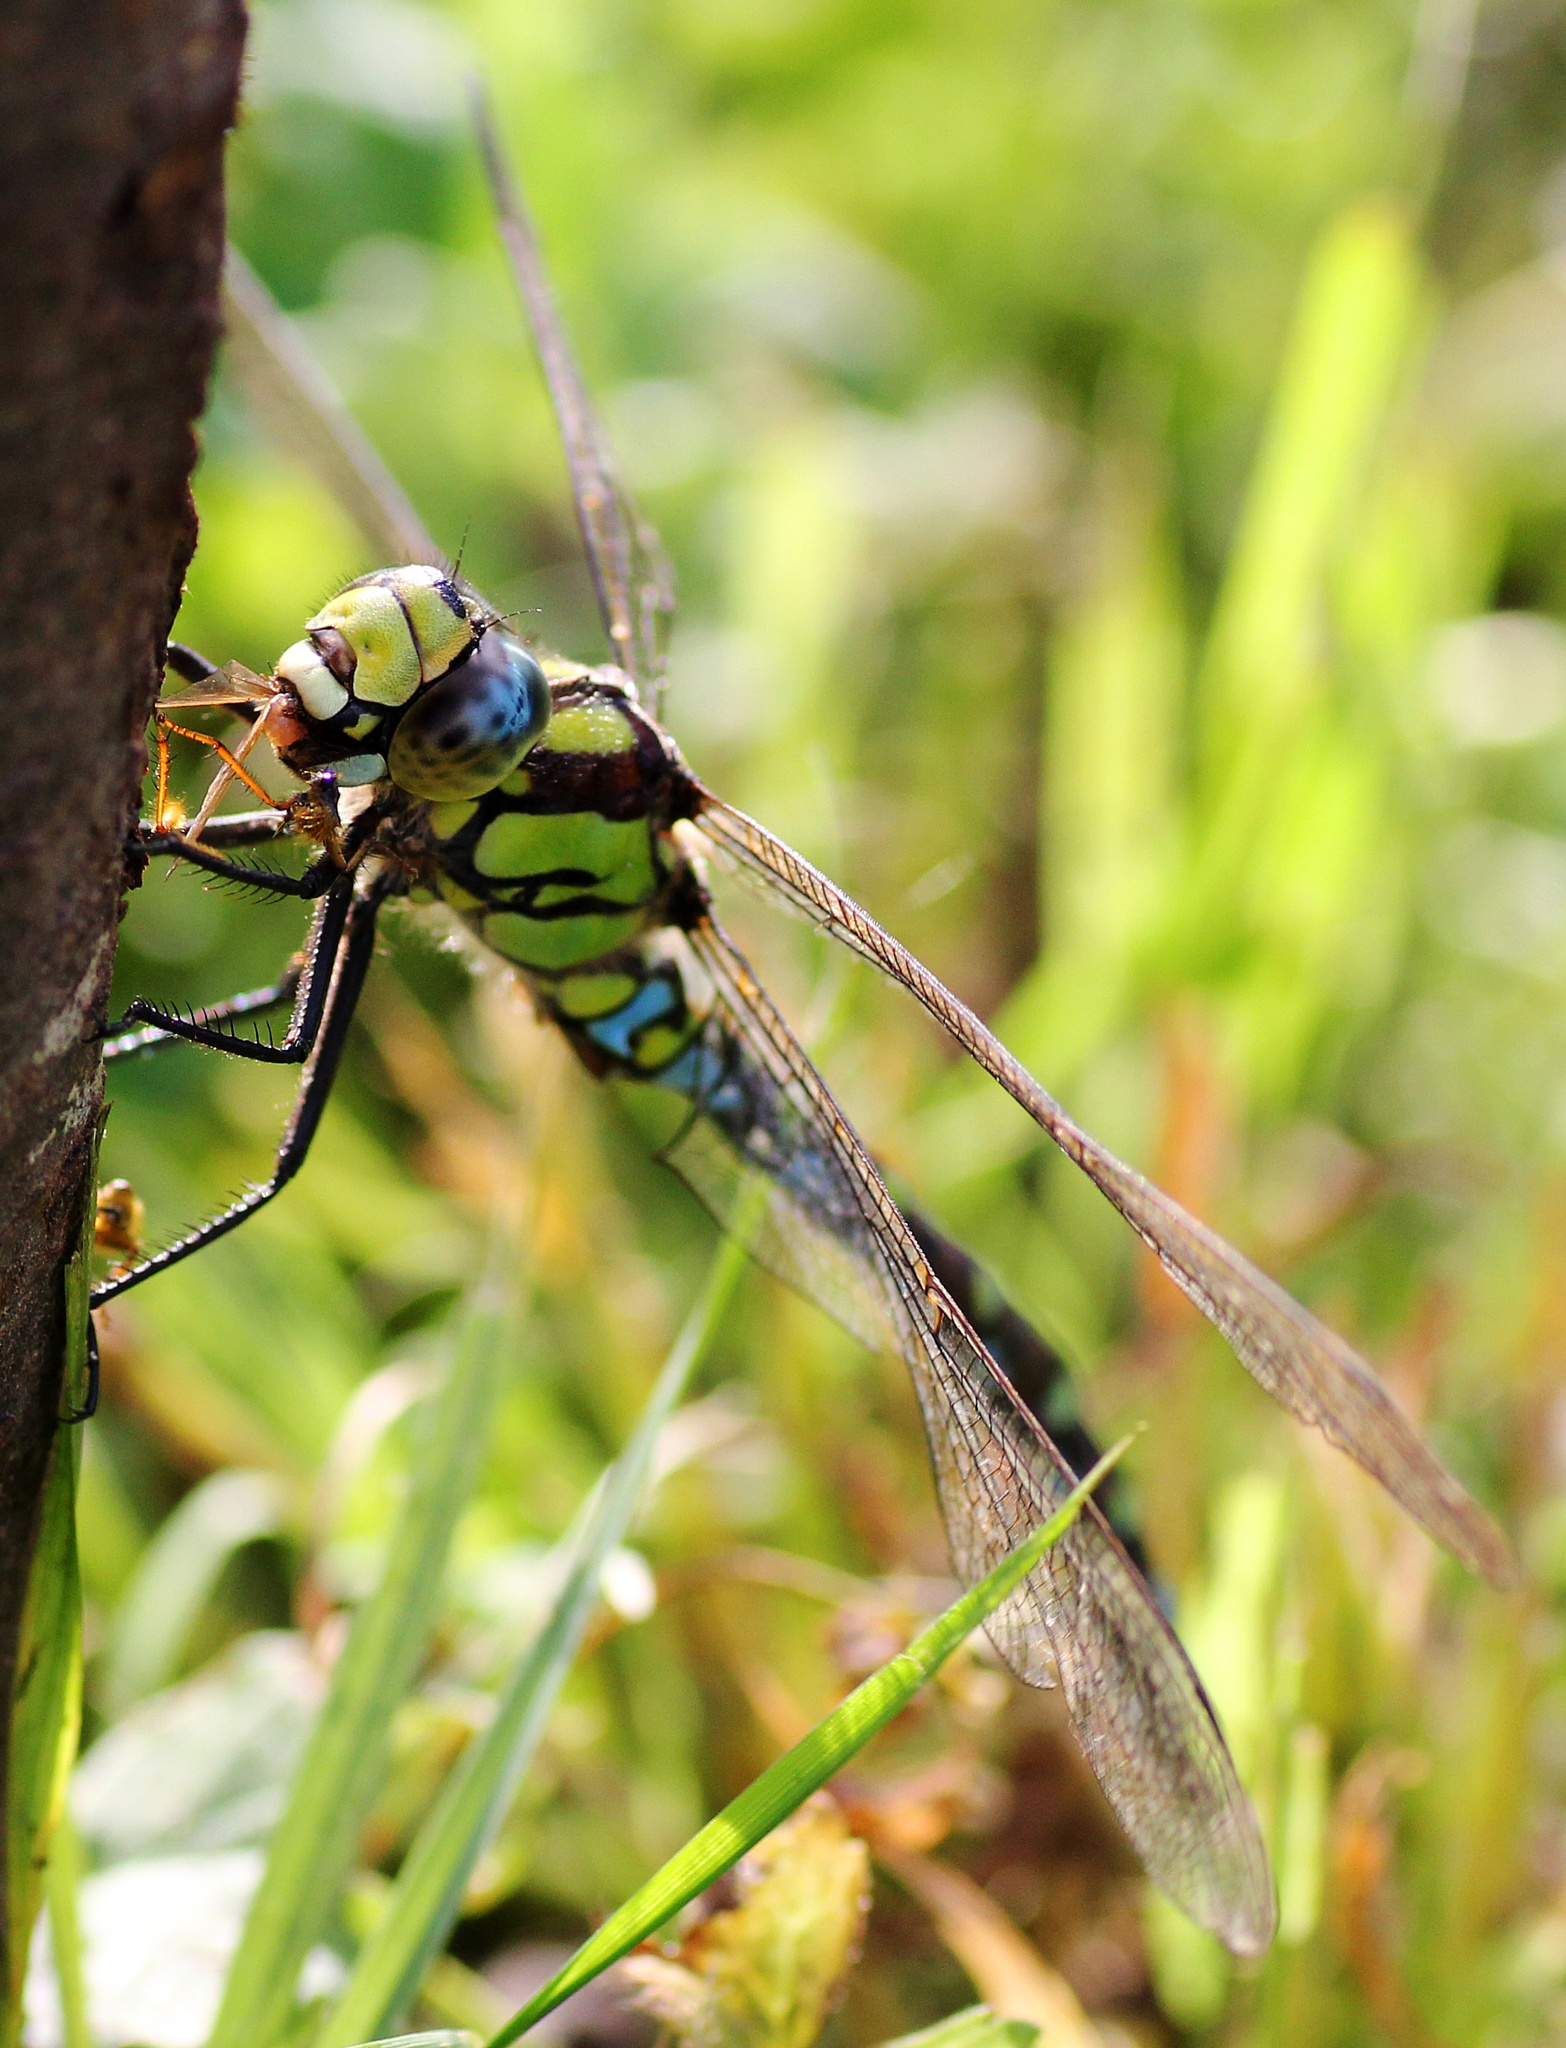 Dragonfly by Chris Kilpatrick